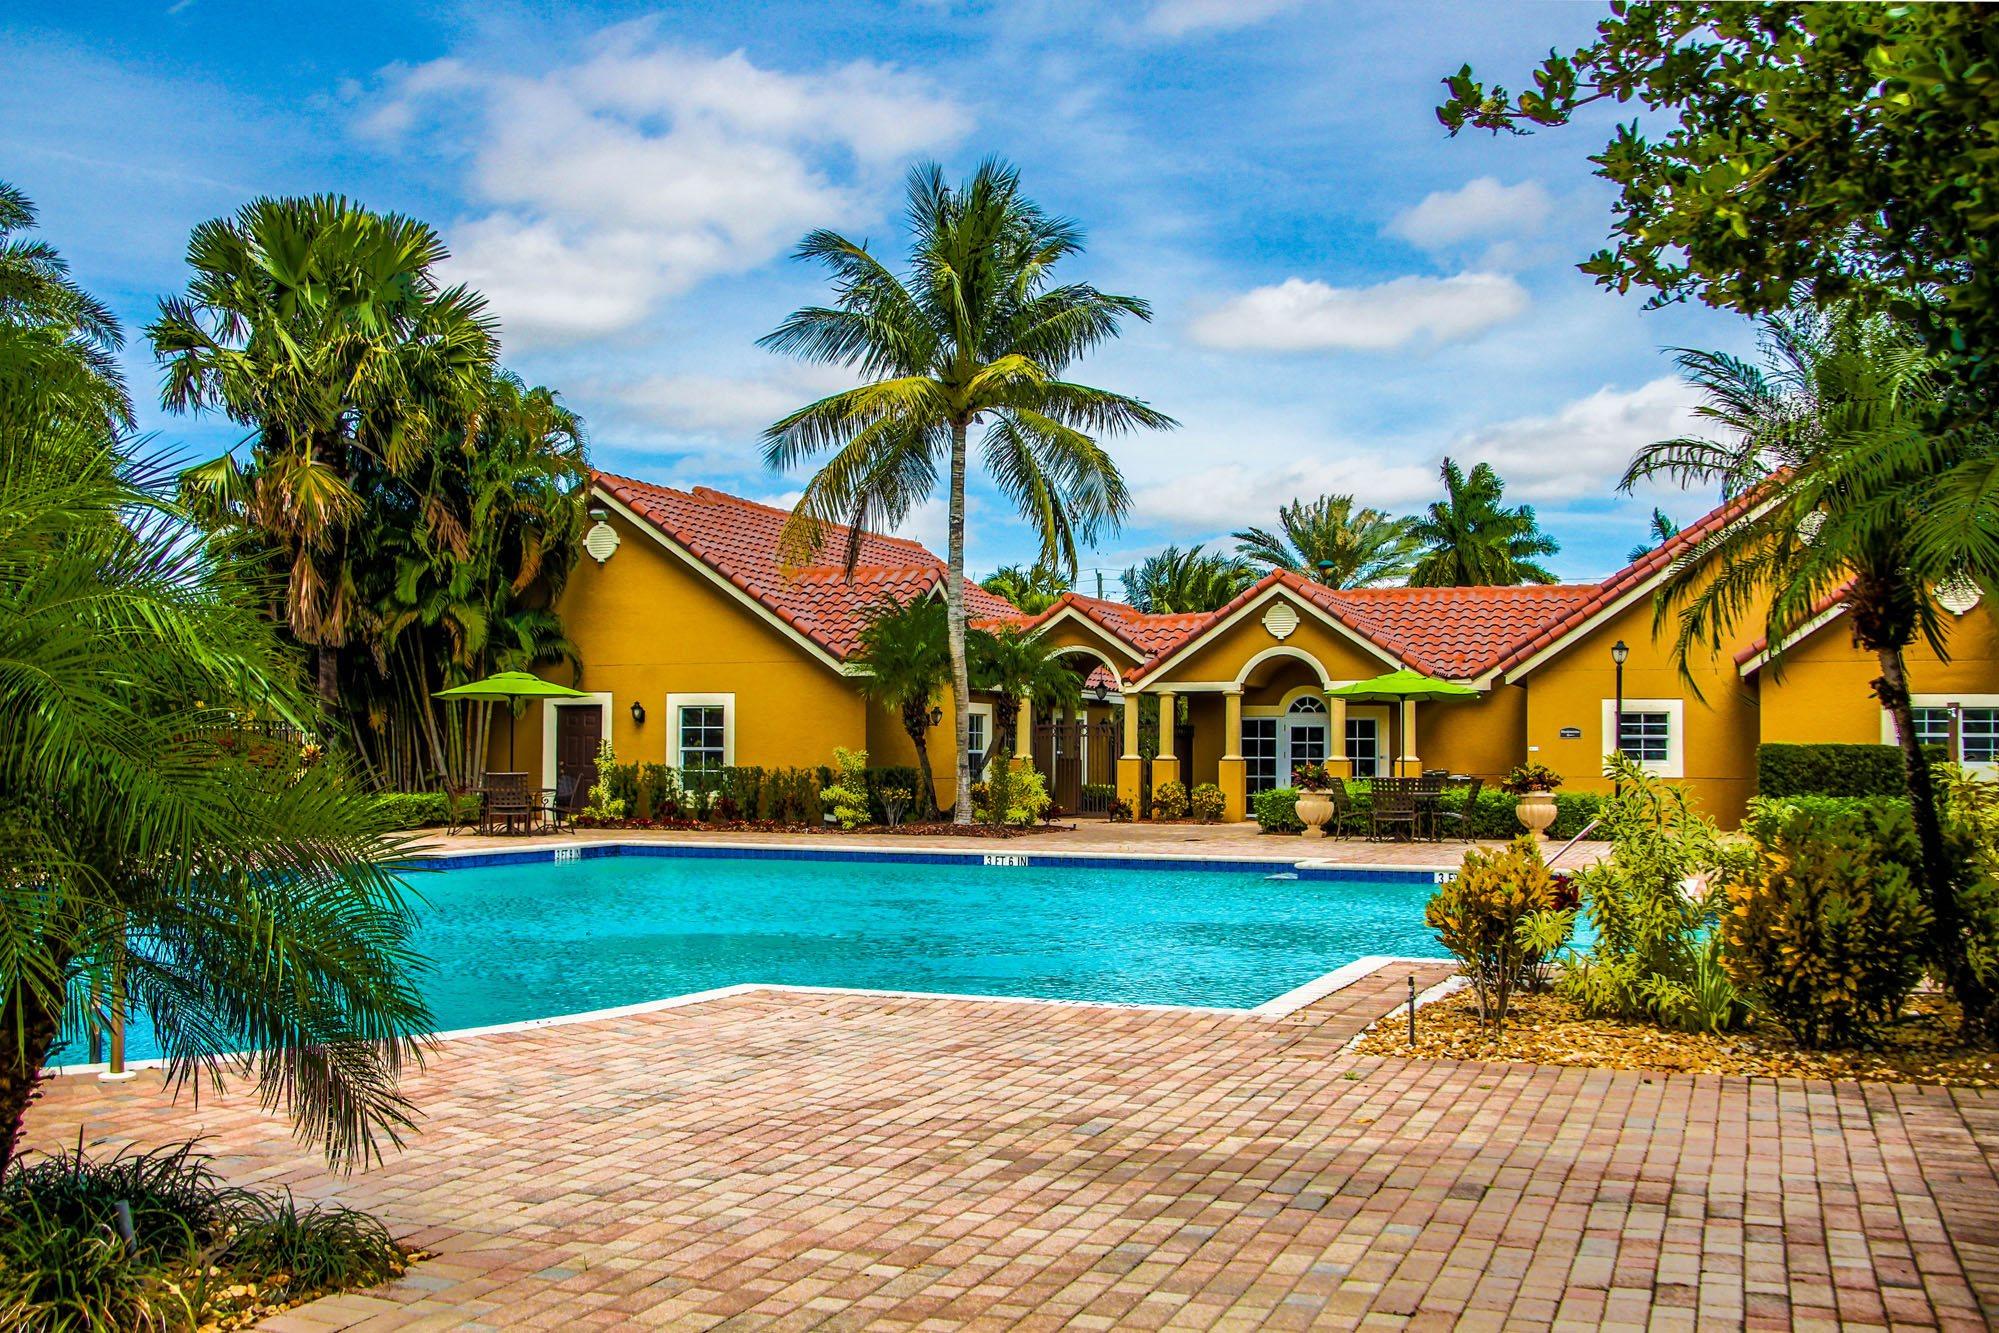 Oasis Delray Beach Apartments in Delray, FL